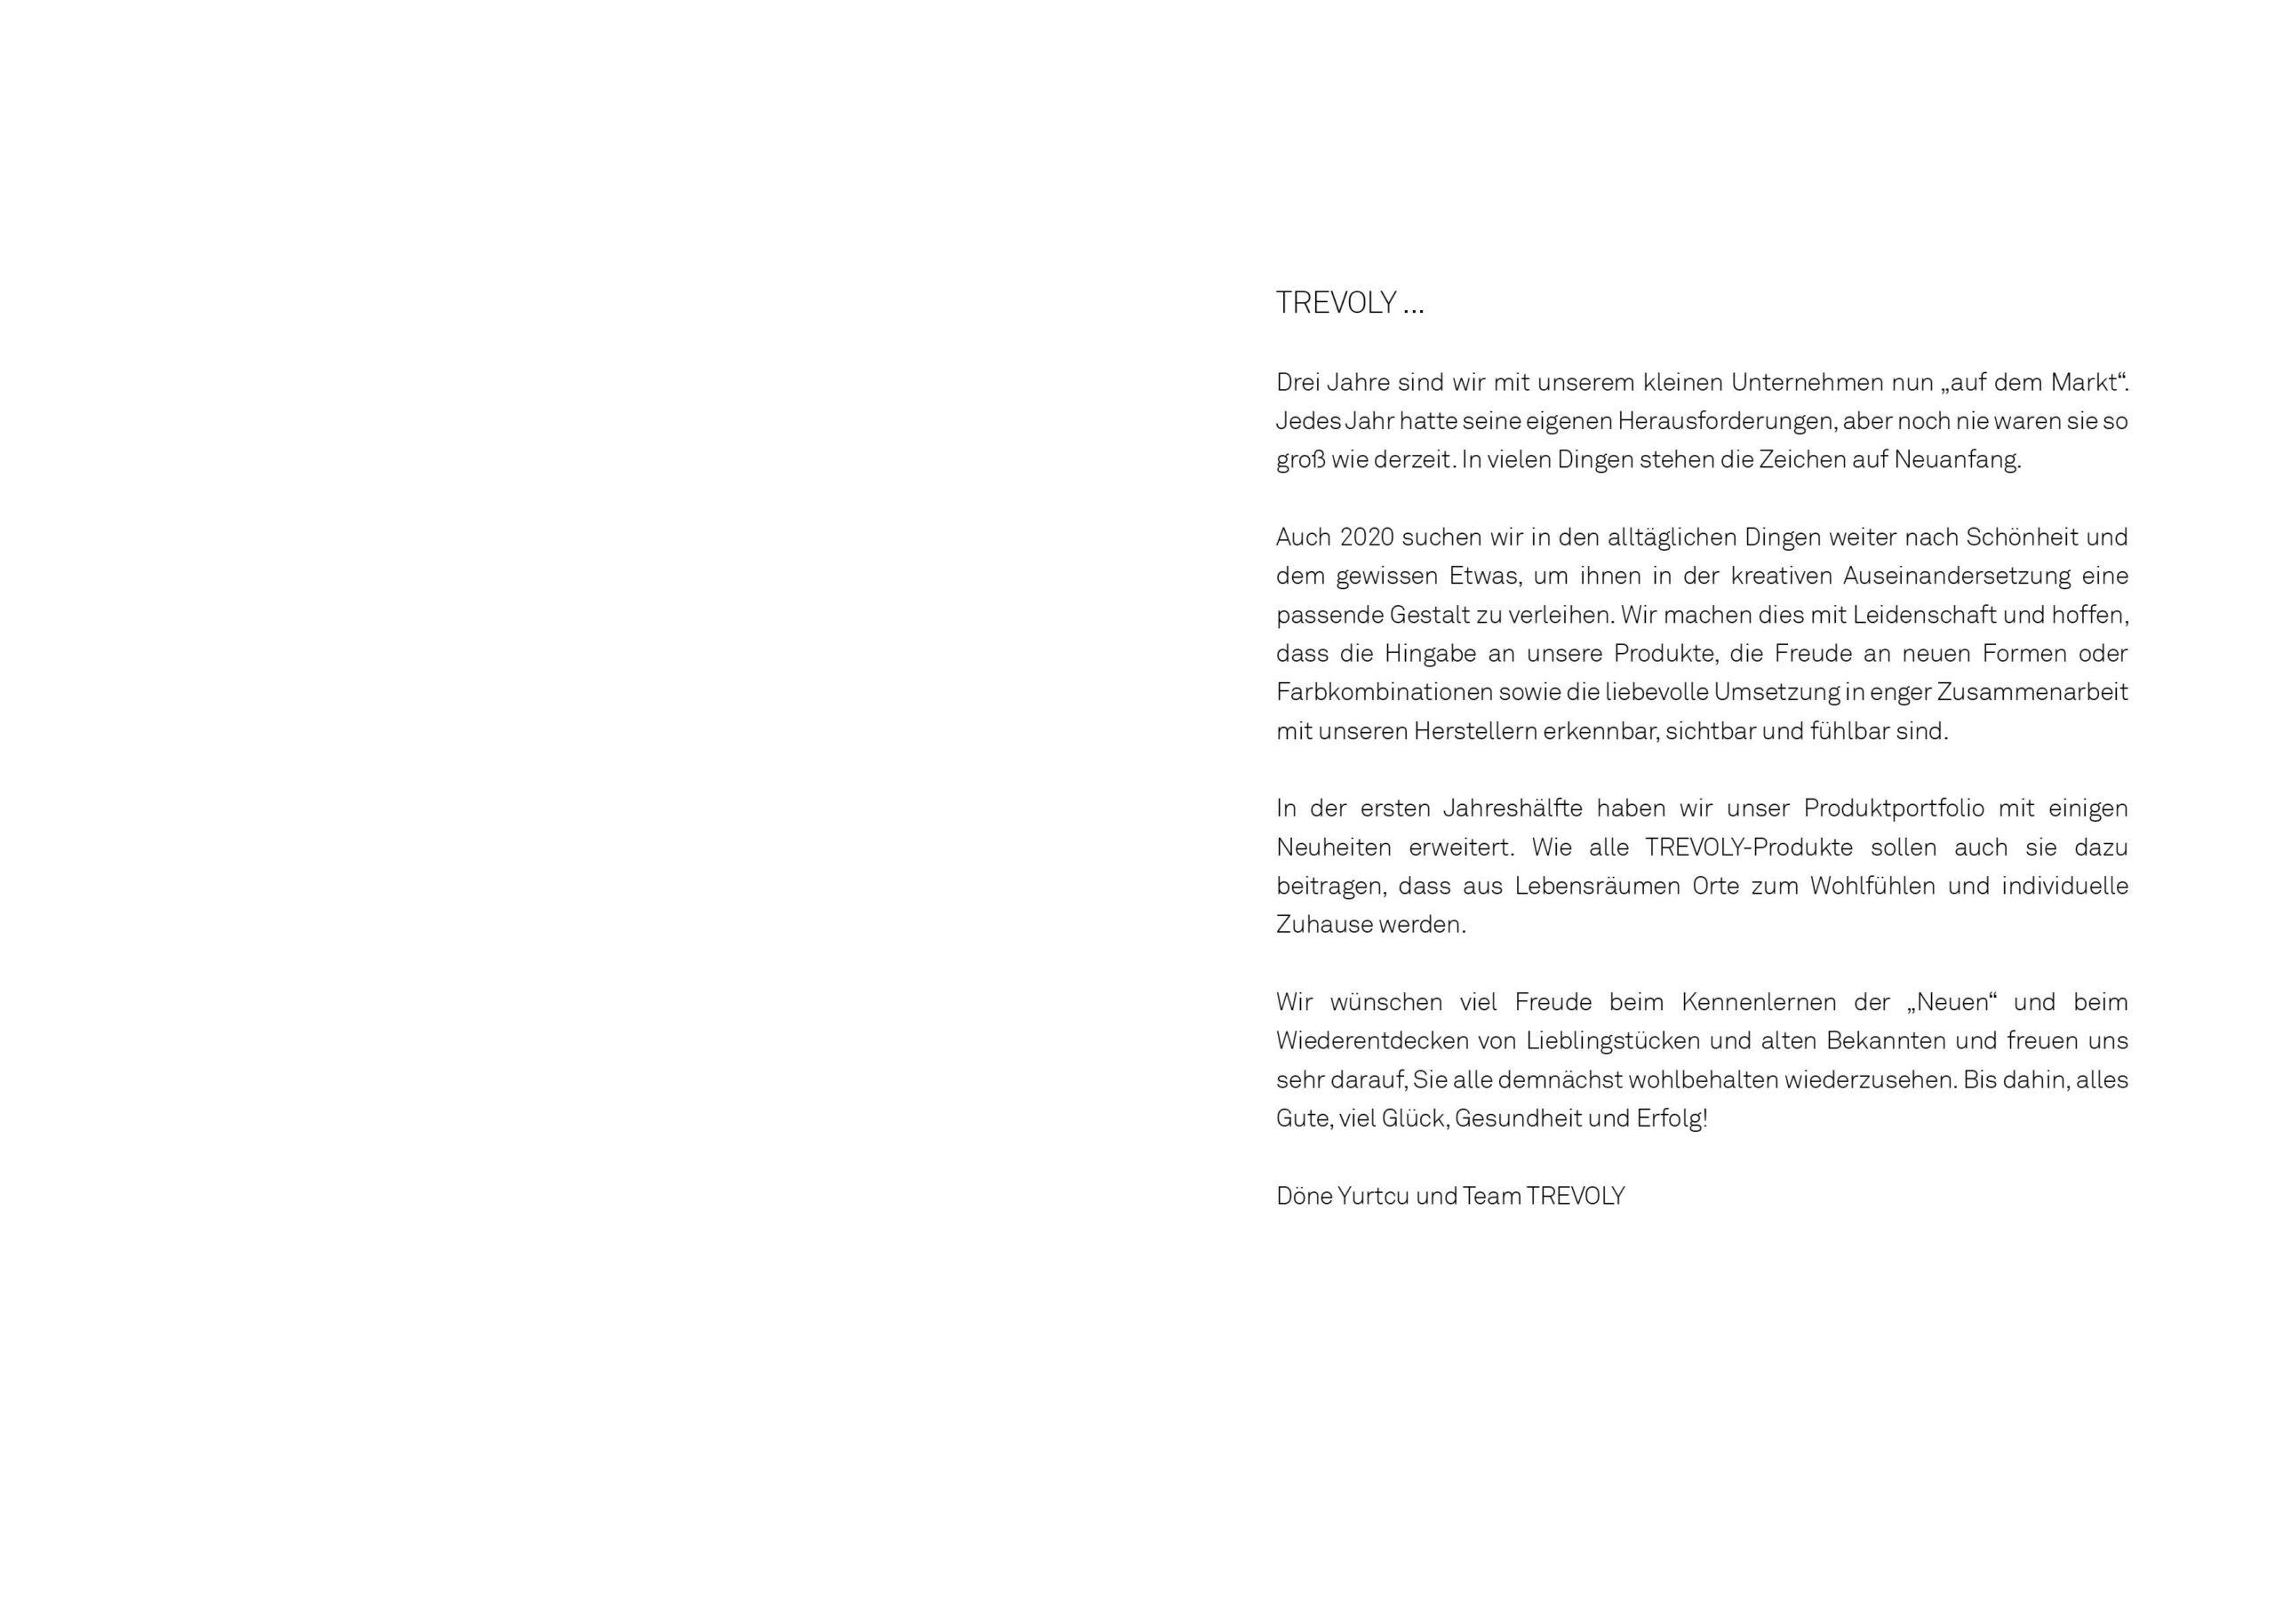 Katalog_Trevoly_No.1 20202